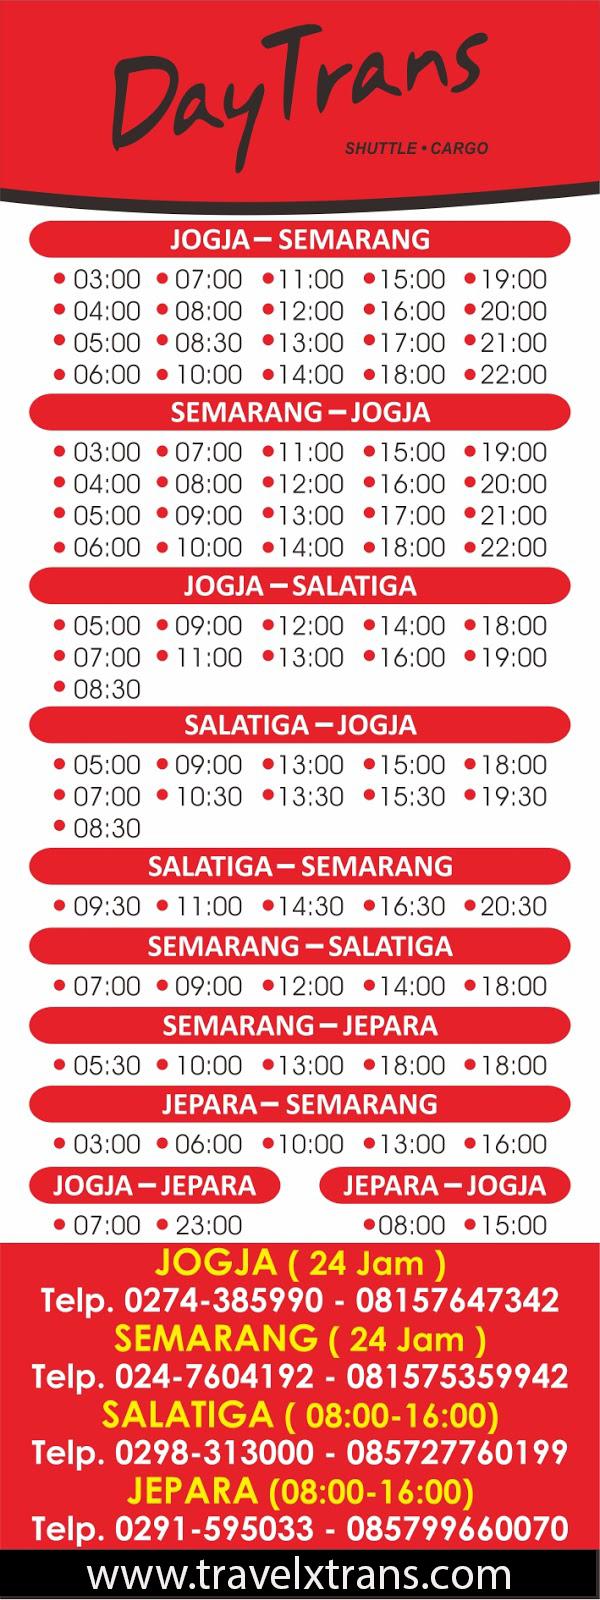 Jadwal Day Trans Jogja Semarang